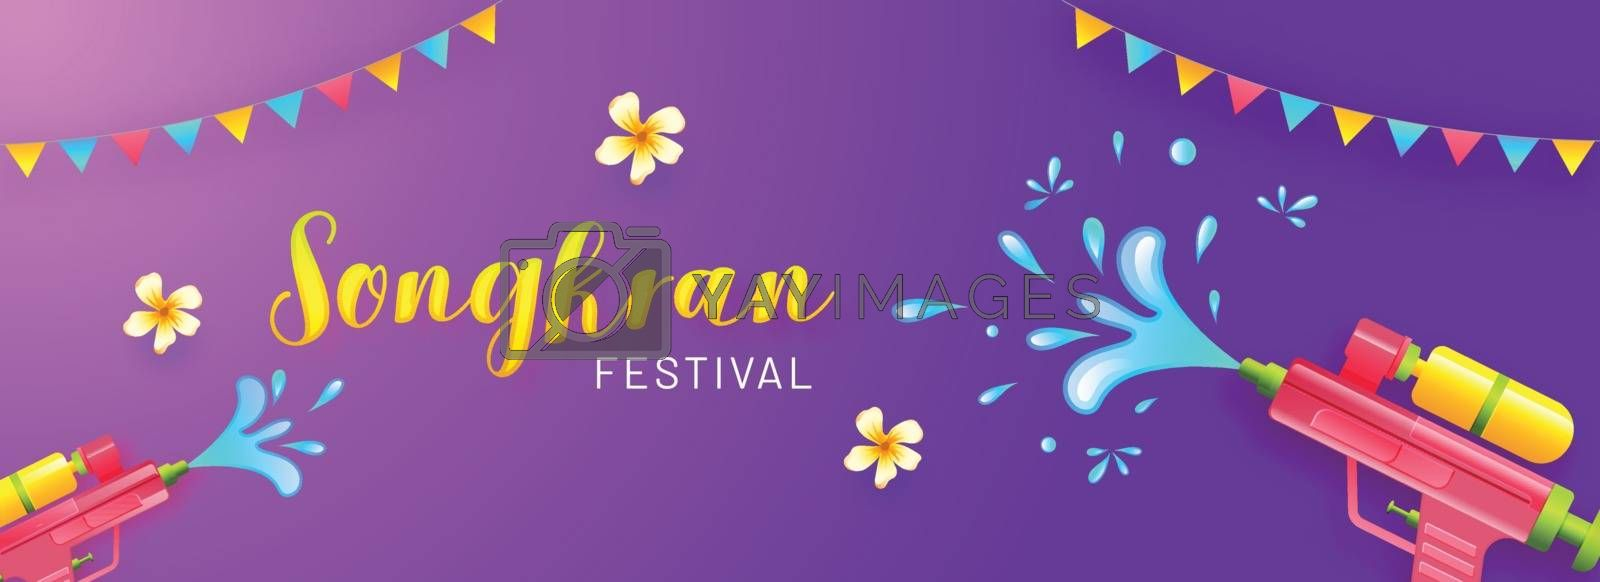 Royalty free image of Songkran festival celebration header banner or poster design on  by aispl